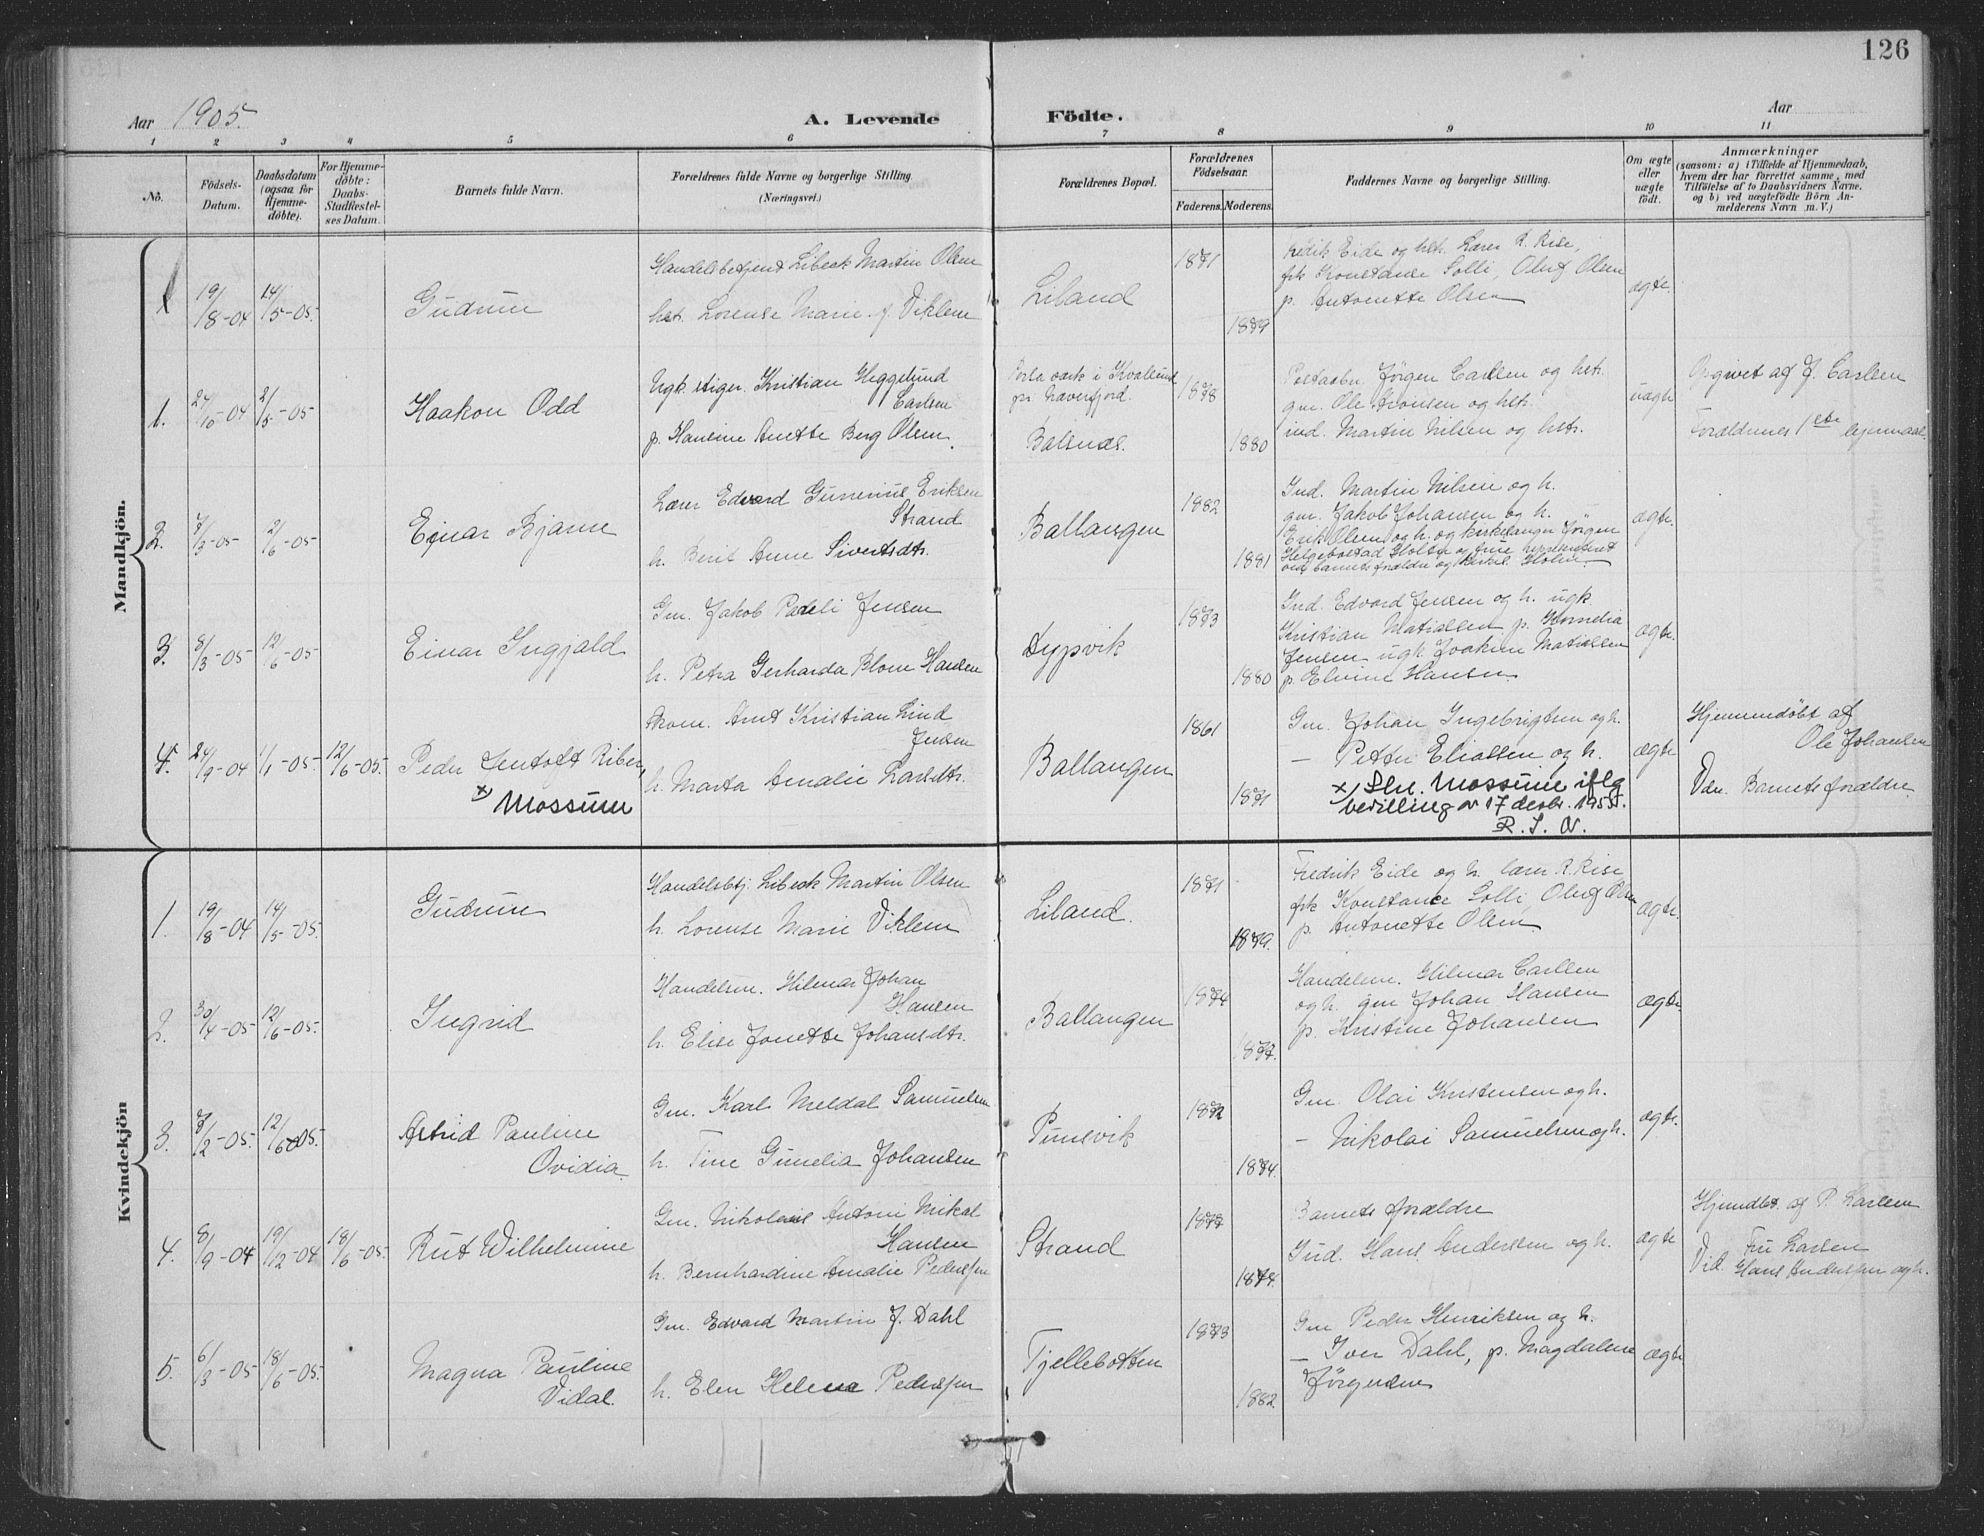 SAT, Ministerialprotokoller, klokkerbøker og fødselsregistre - Nordland, 863/L0899: Ministerialbok nr. 863A11, 1897-1906, s. 126